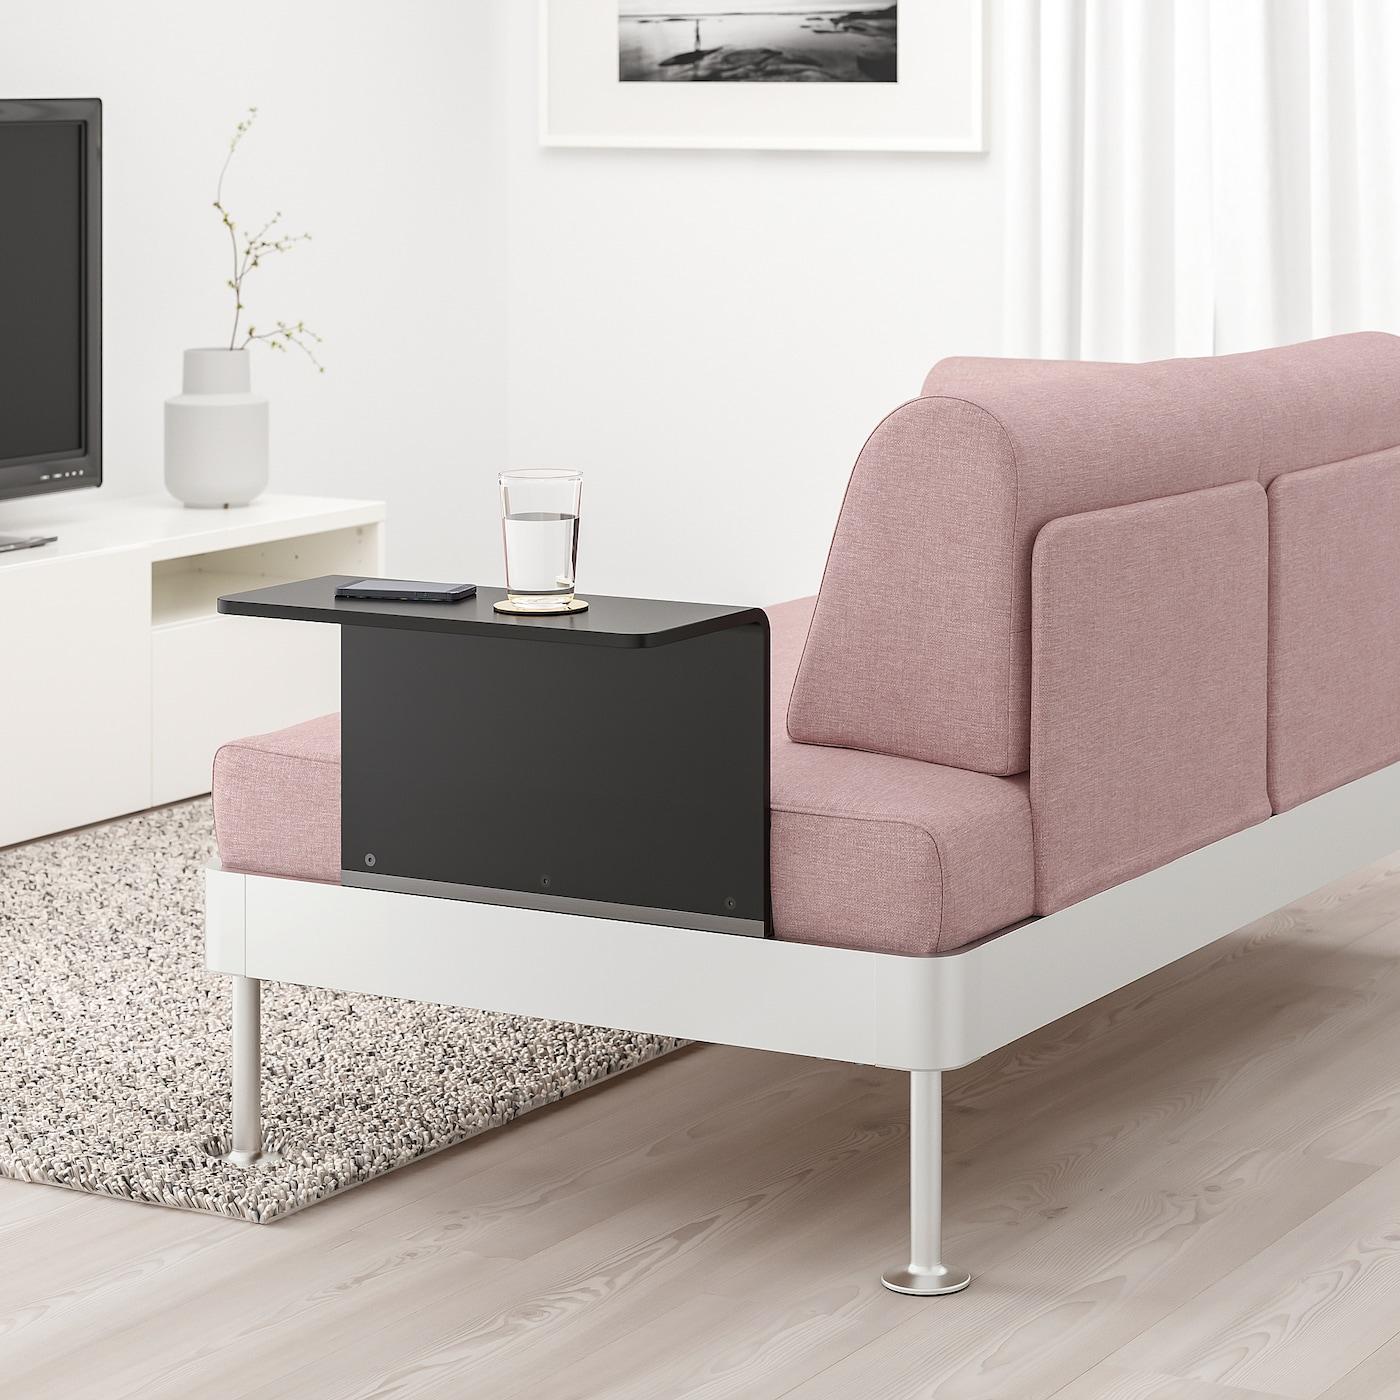 Delaktig 2 Seat Sofa With Side Table